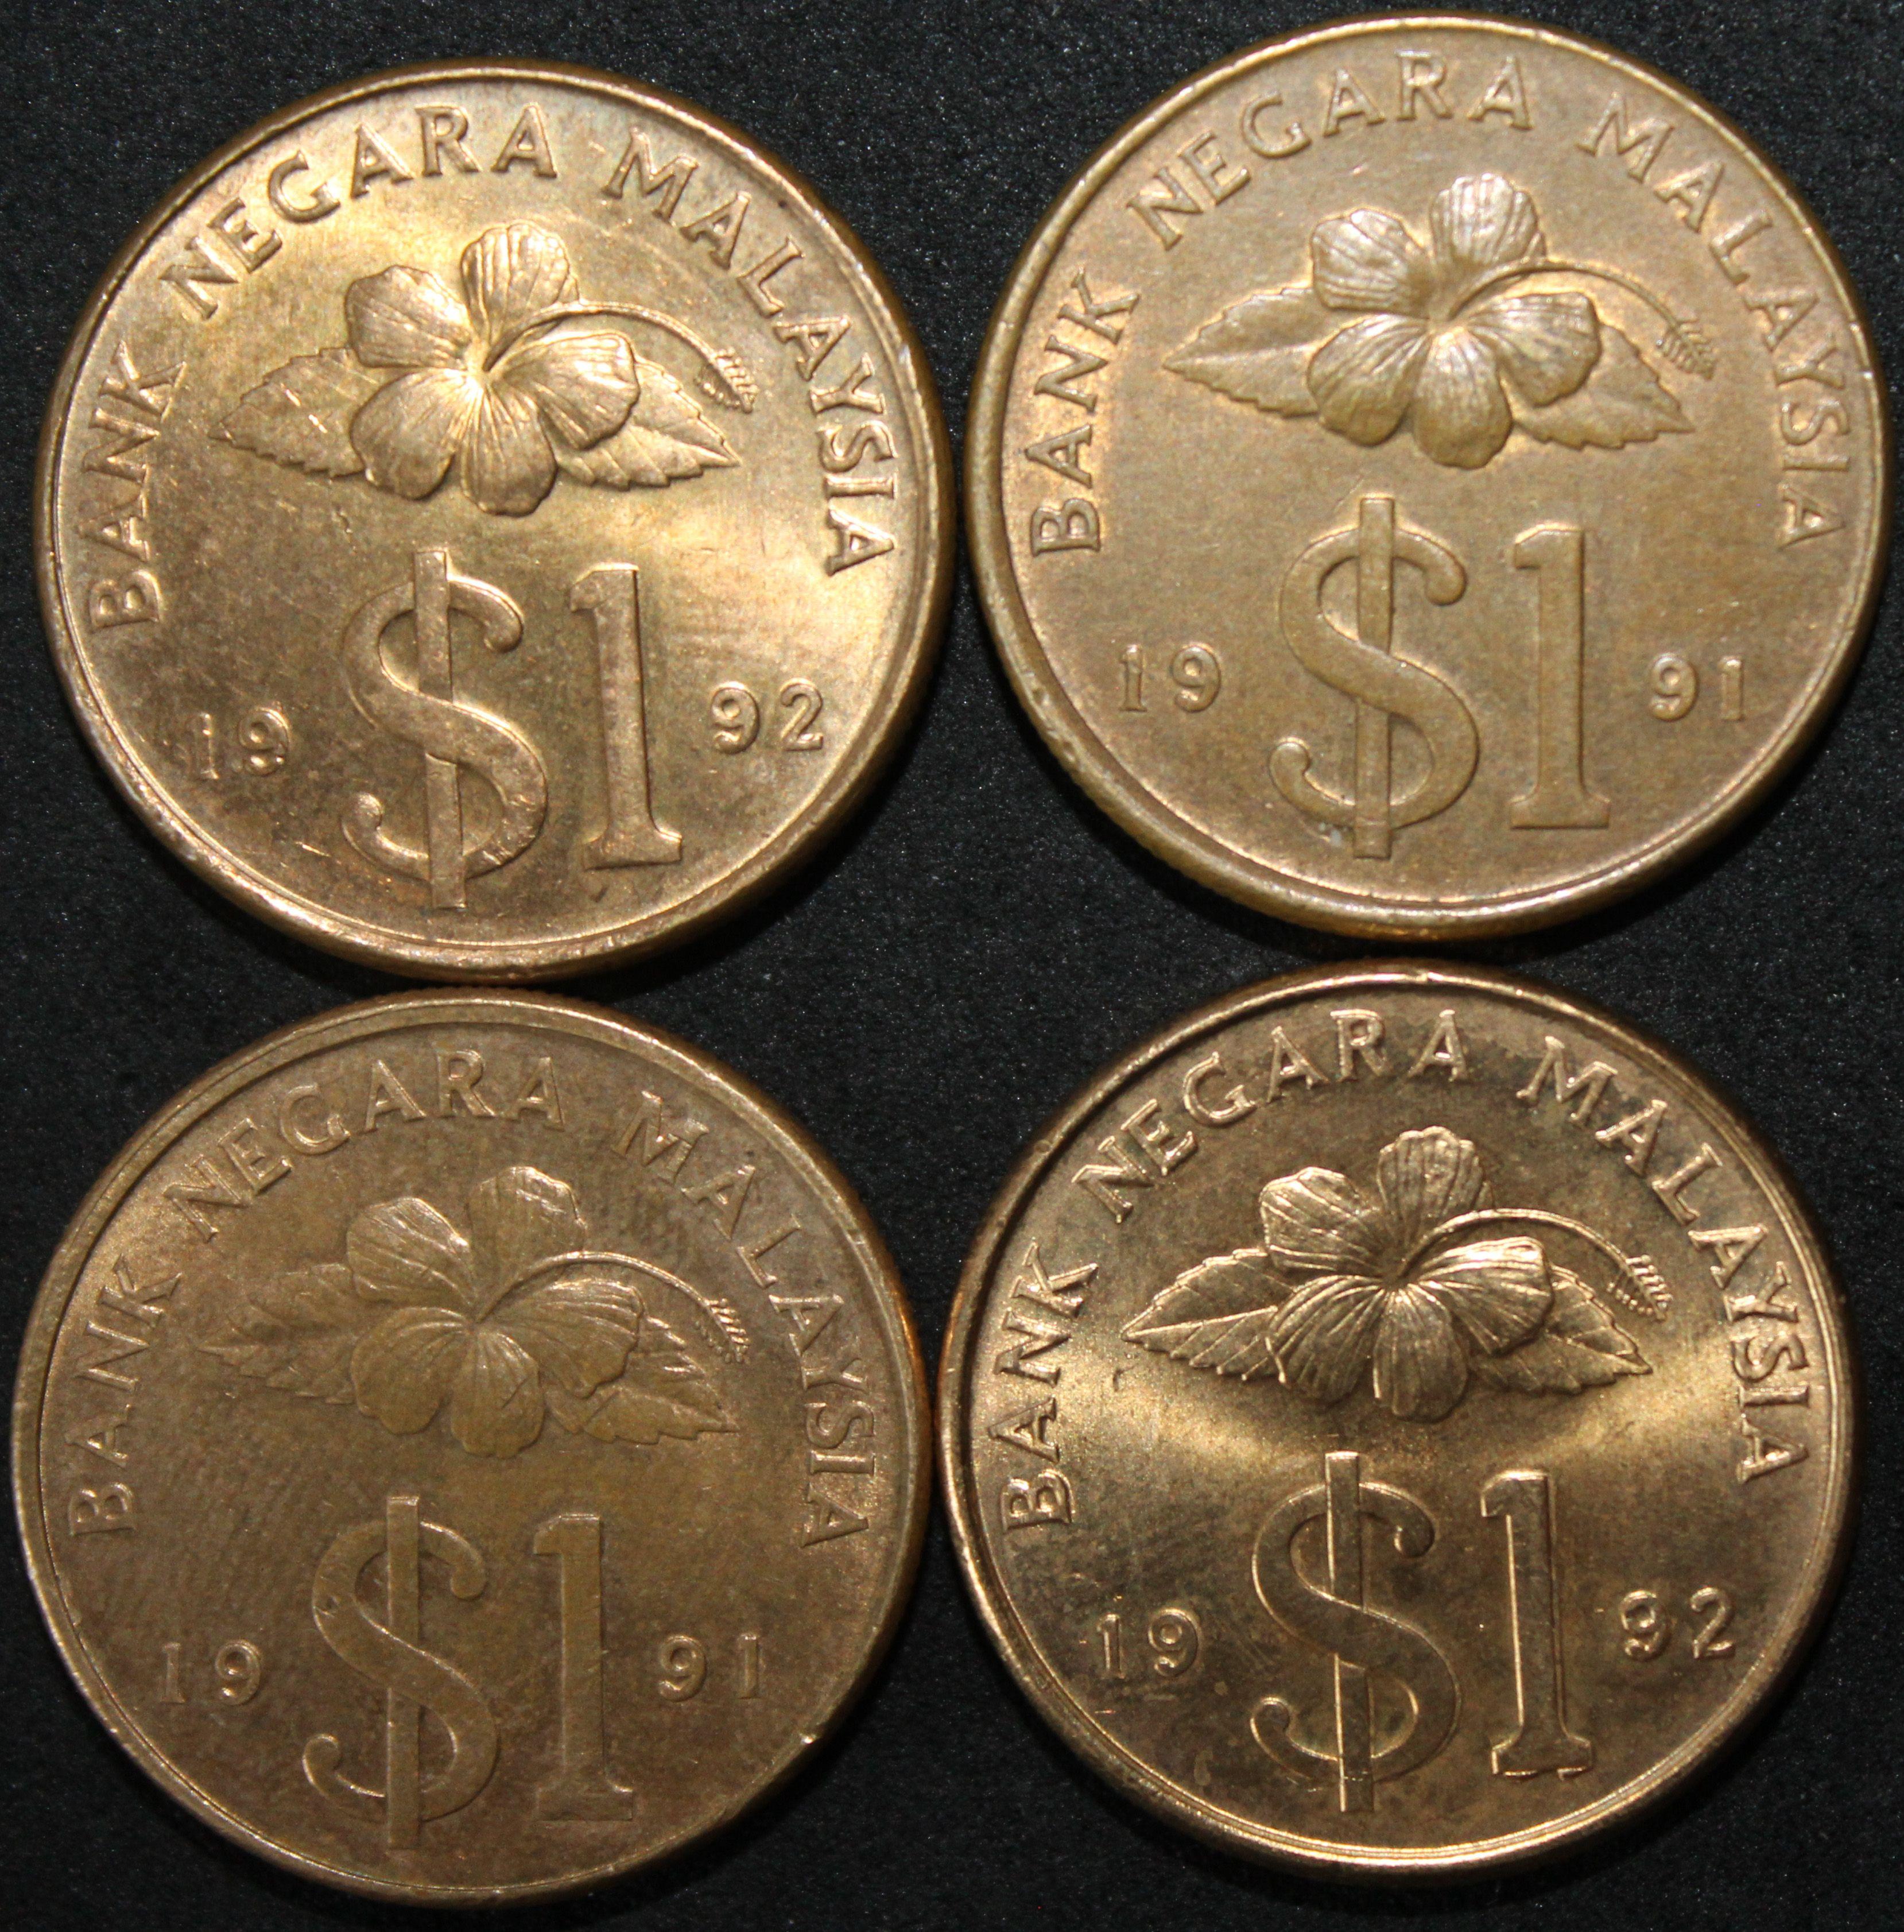 Mix Of Malaysia 1 Dollar Coins Bulk Coins Km Coins Monedas